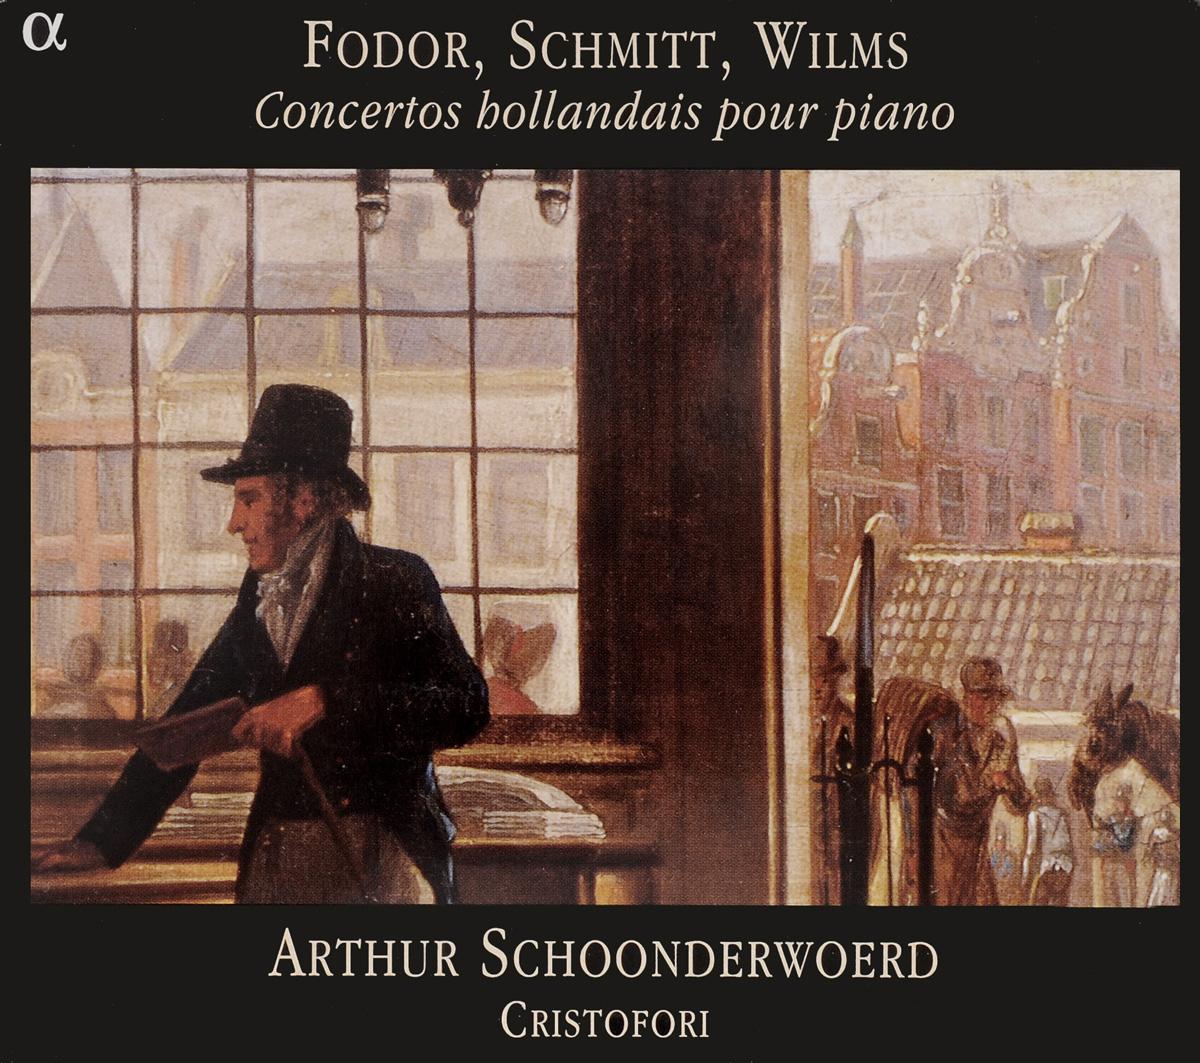 Fodor / Schmitt Wilms - Arthur Schoonderwoerd, Cristofori. Concertos Hollandais Pour Piano